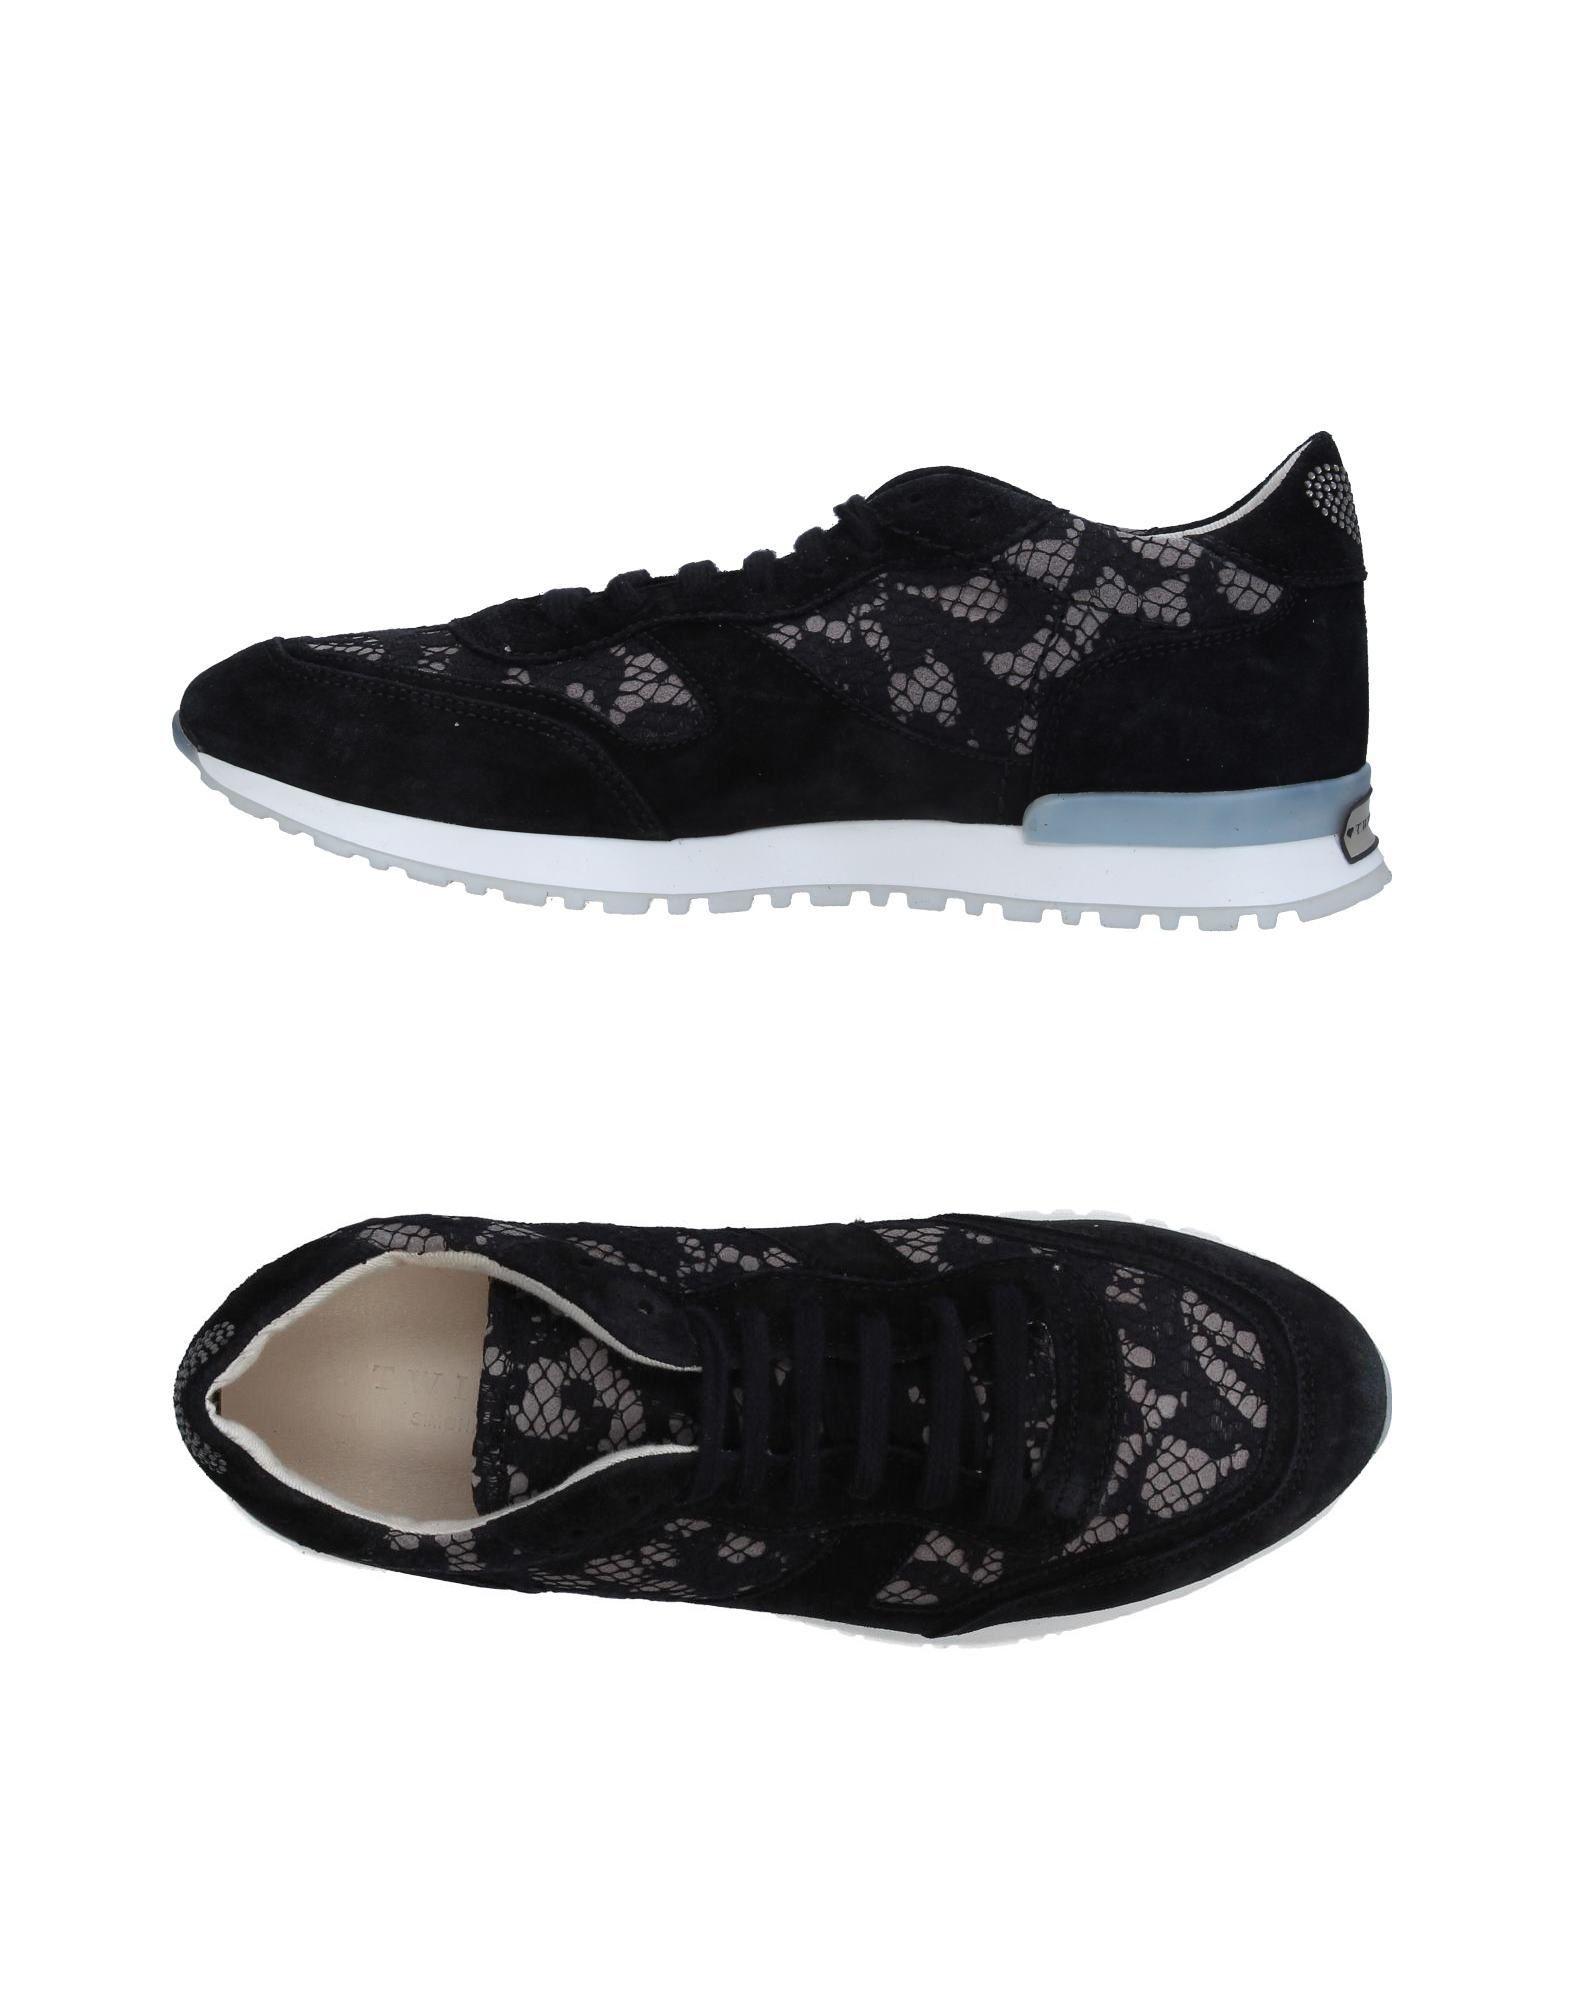 Twin-Set Simona Barbieri Sneakers Barbieri - Women Twin-Set Simona Barbieri Sneakers Sneakers online on  Canada - 11292133FS 9fe306